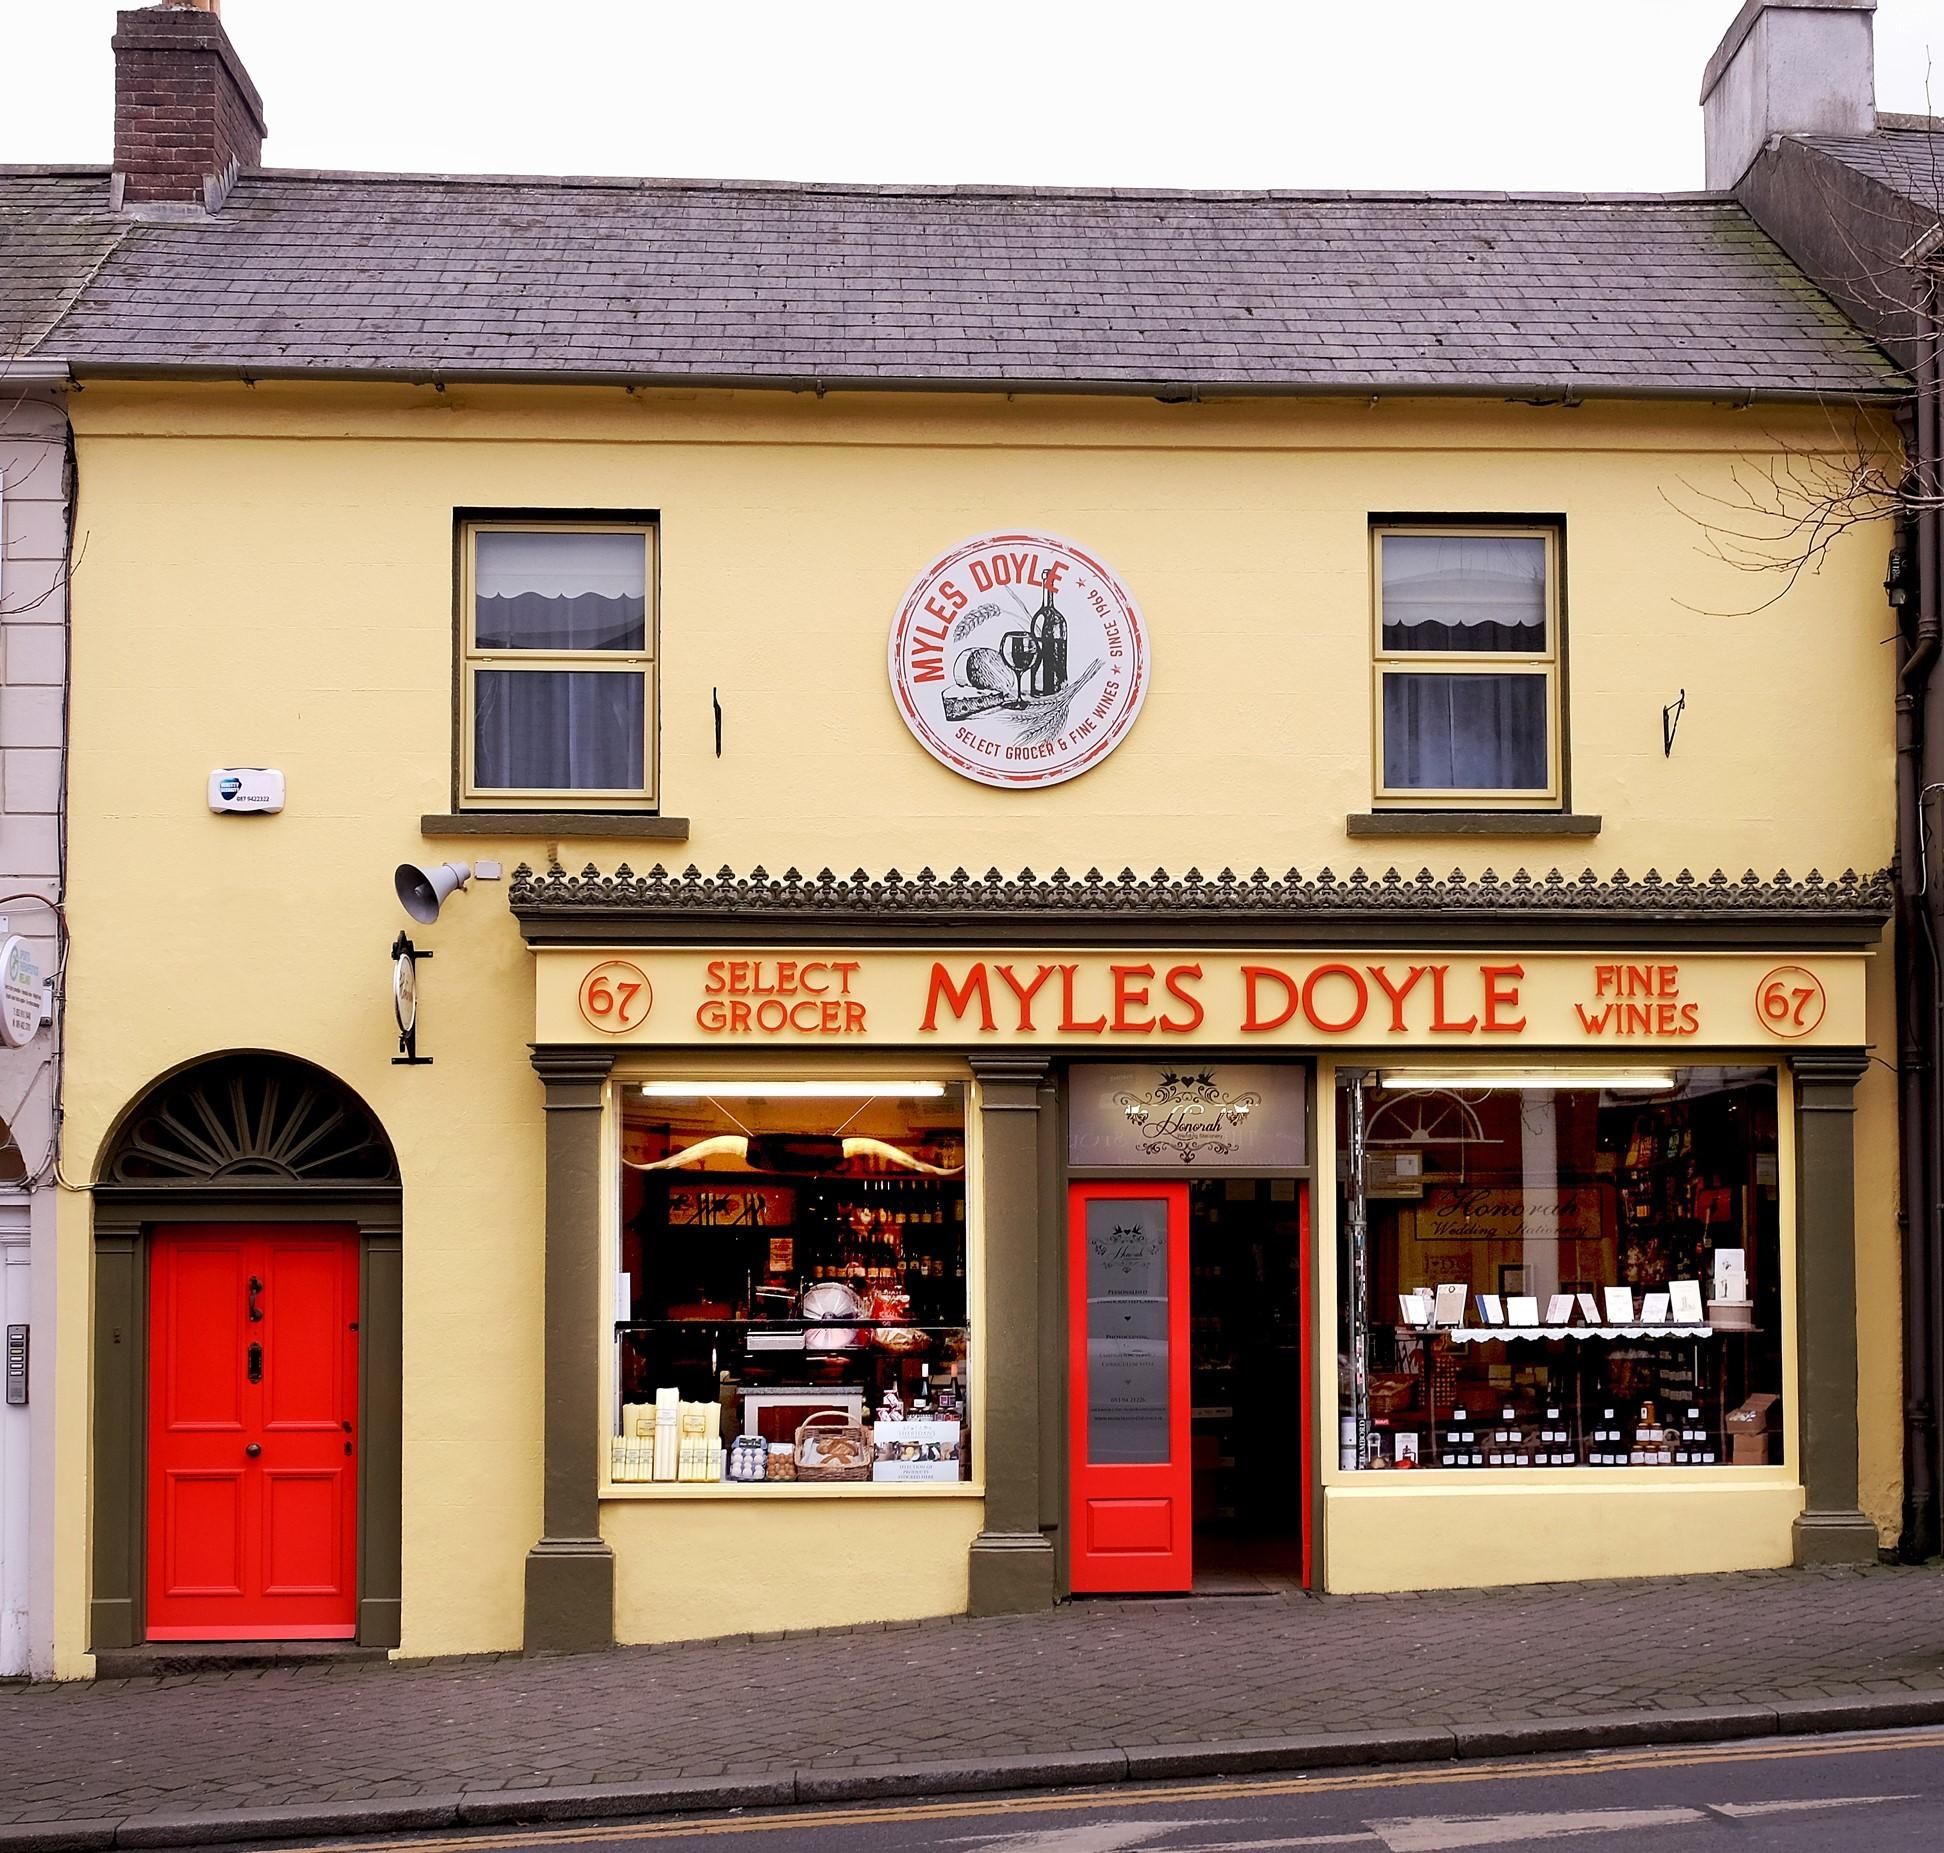 Myles doyle shop 2017